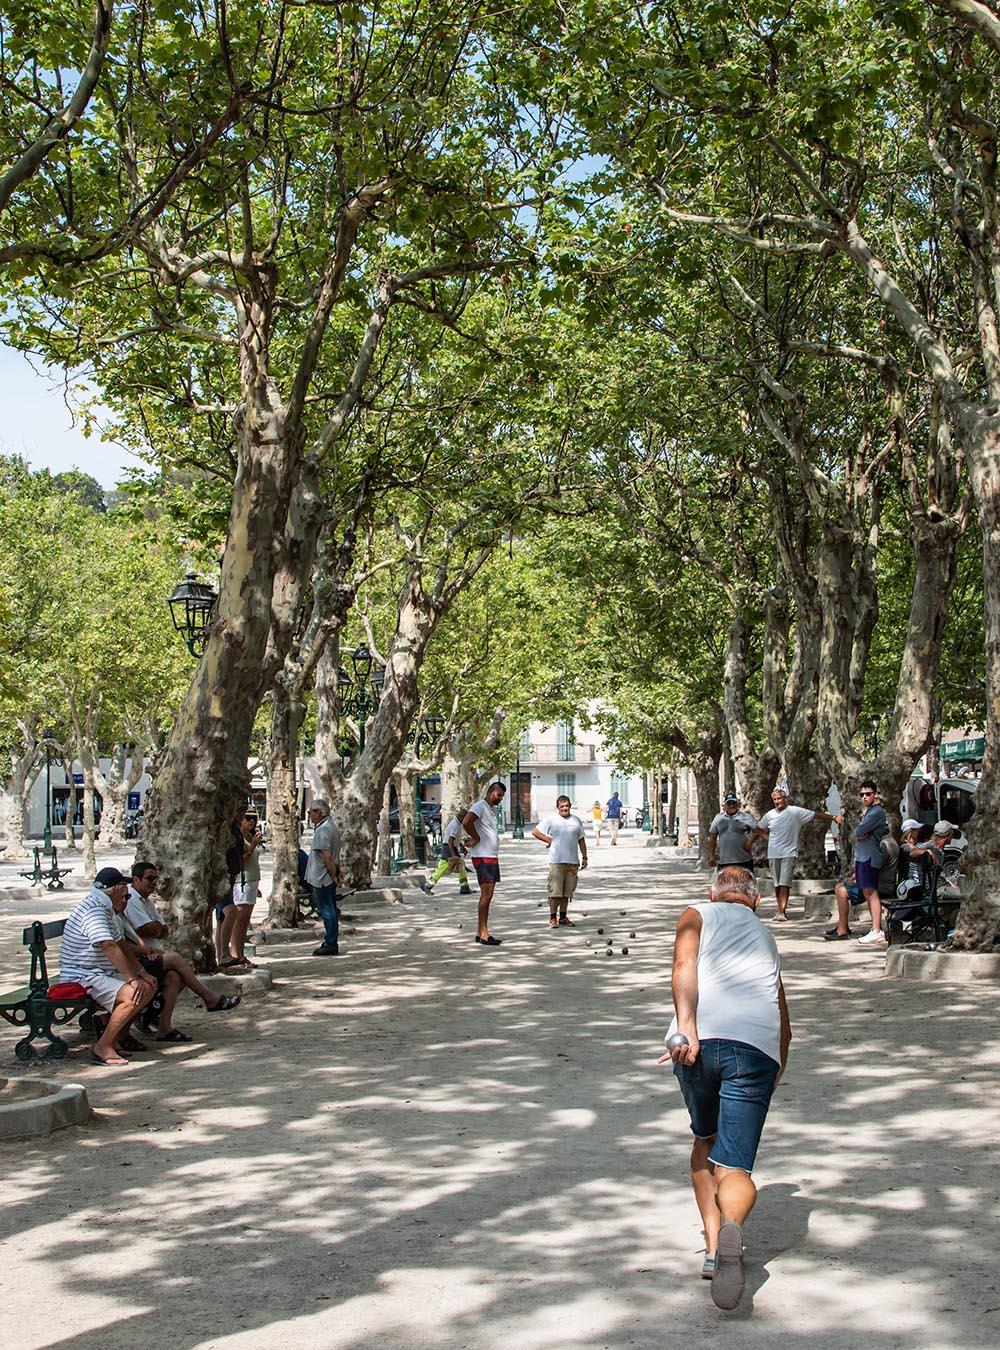 Sommer an der Côte d'Azur - Saint Tropez Petanque